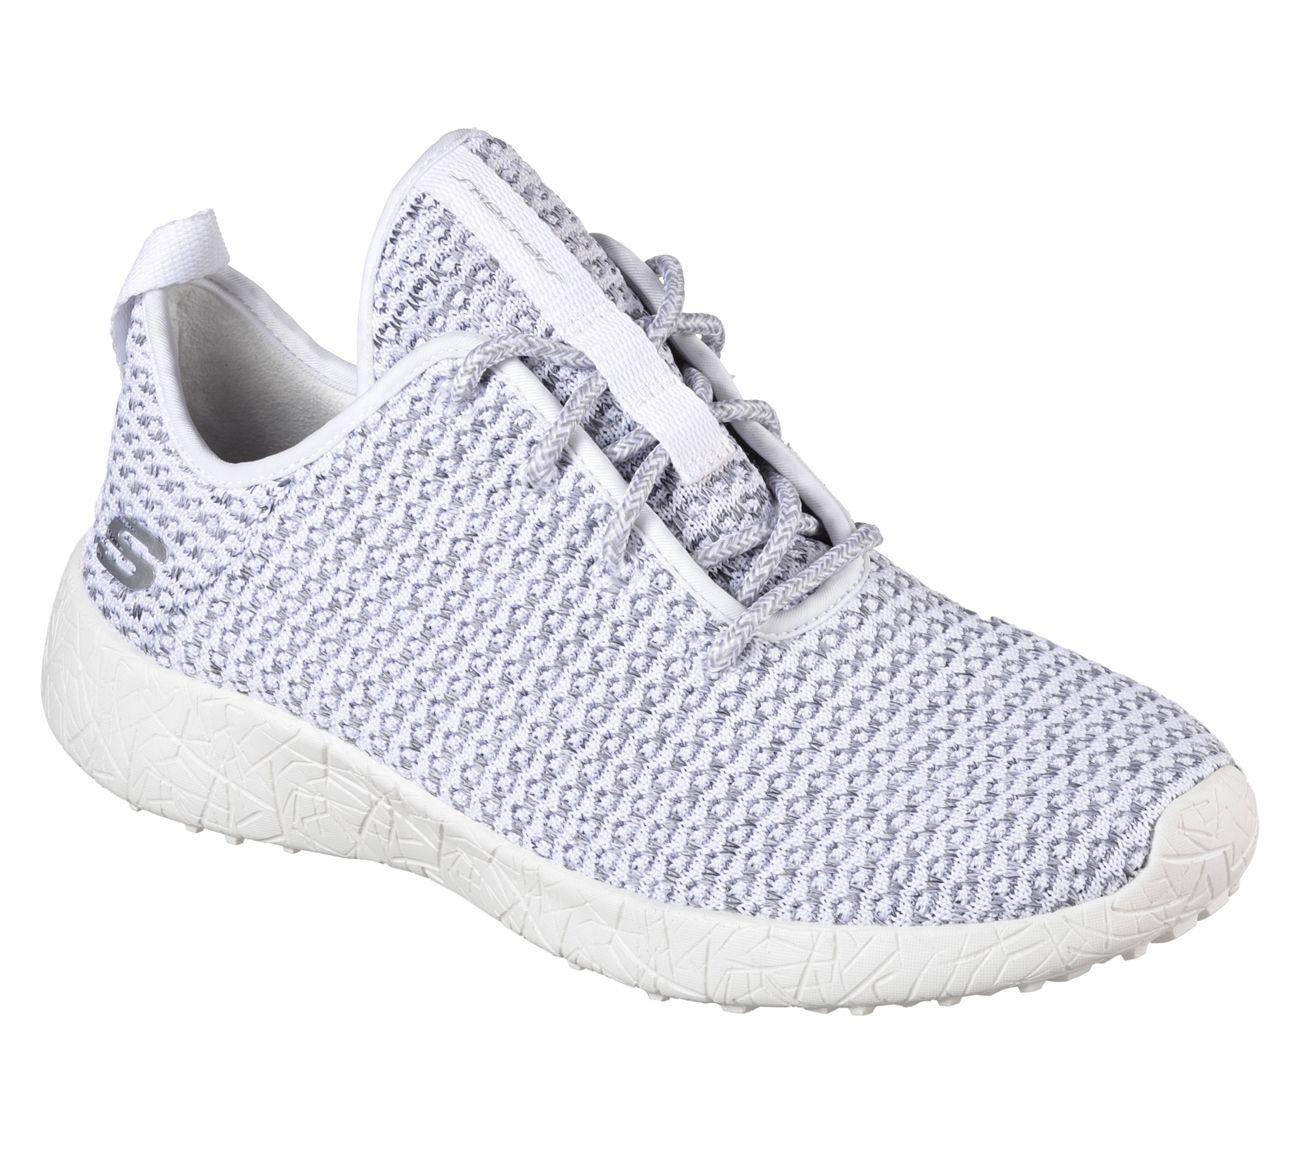 City Scene shoe. Soft woven sporty knit